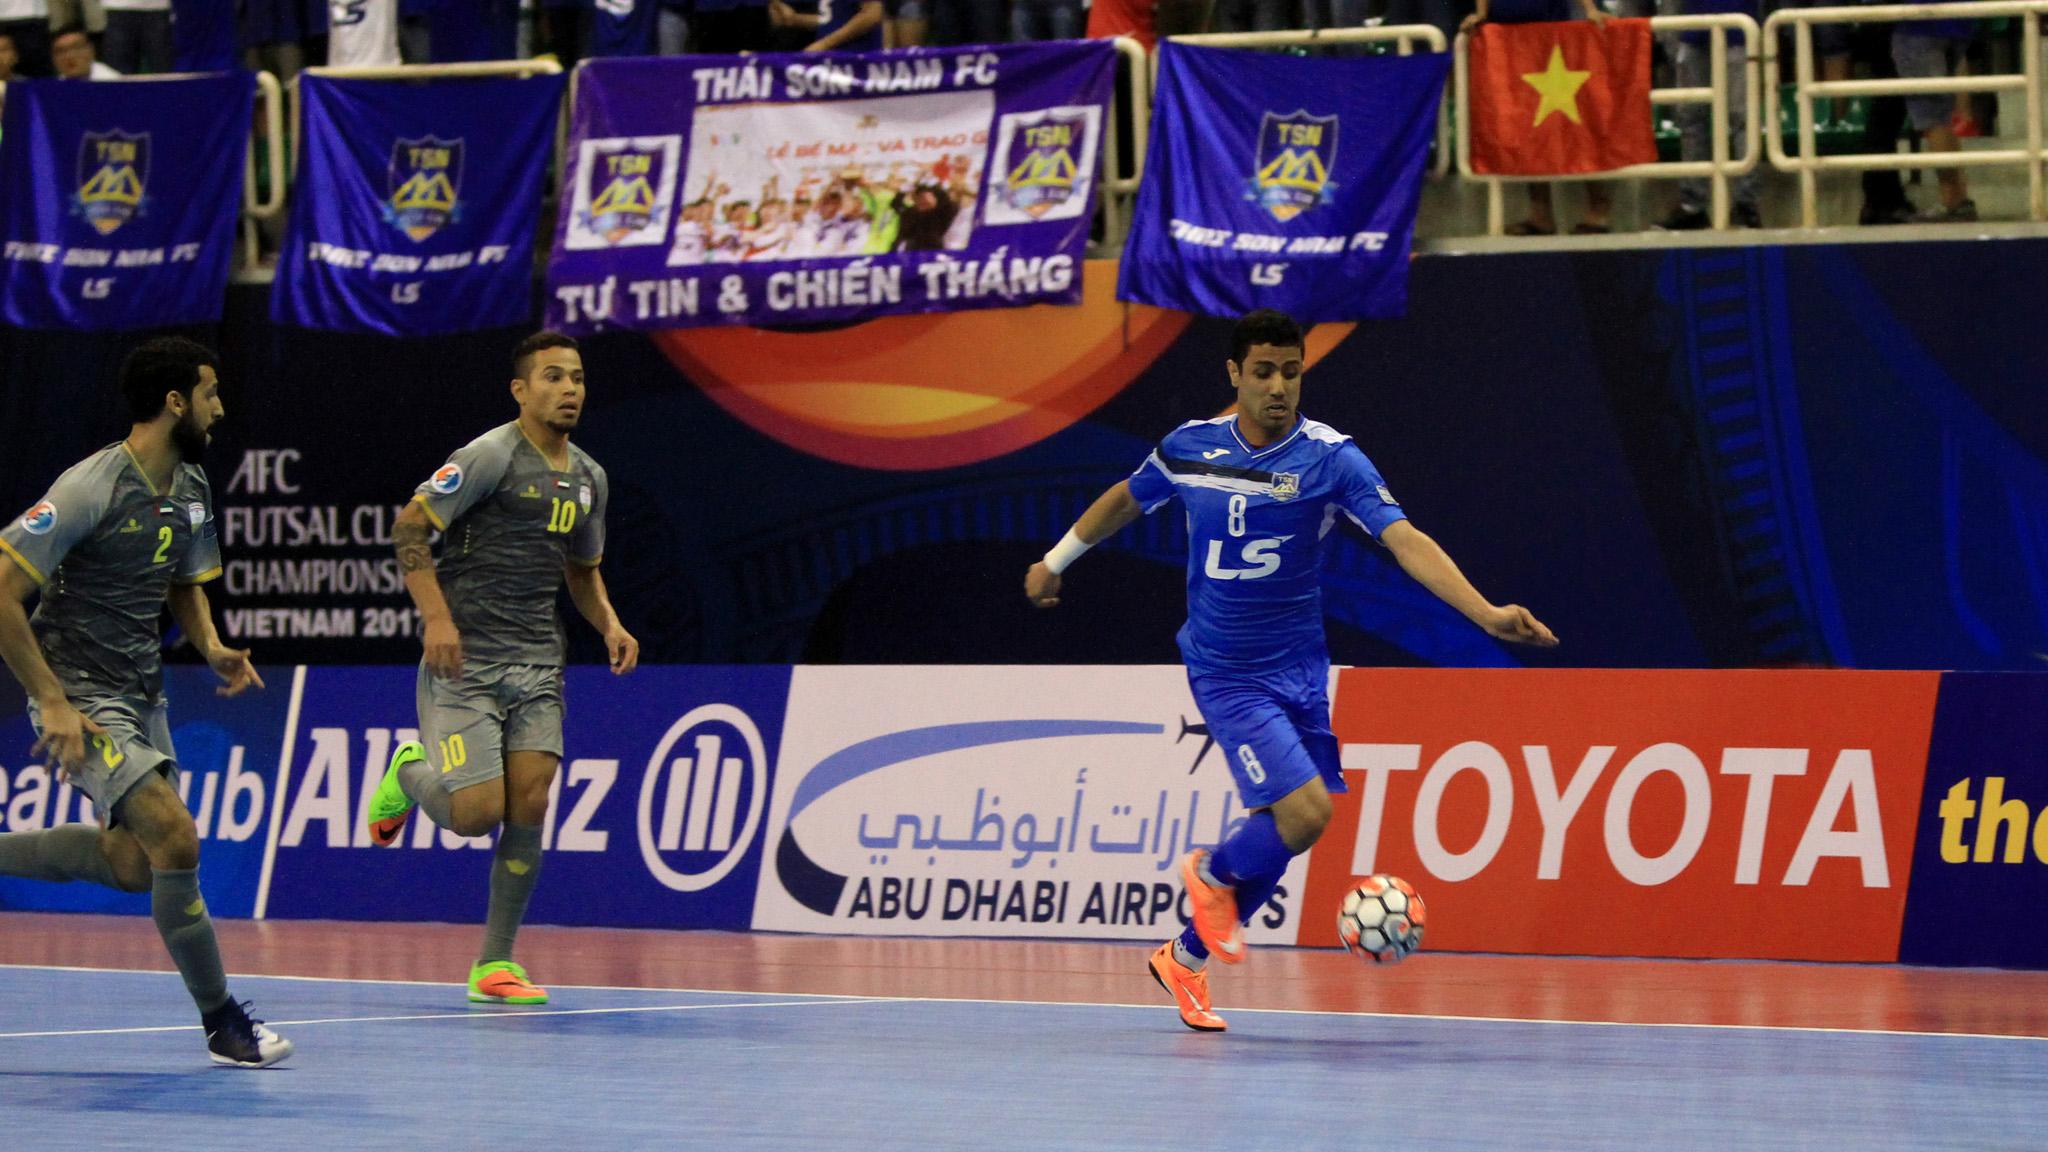 2017 AFC Futsal Club Championship | Thai Son Nam vs Al Dhafra